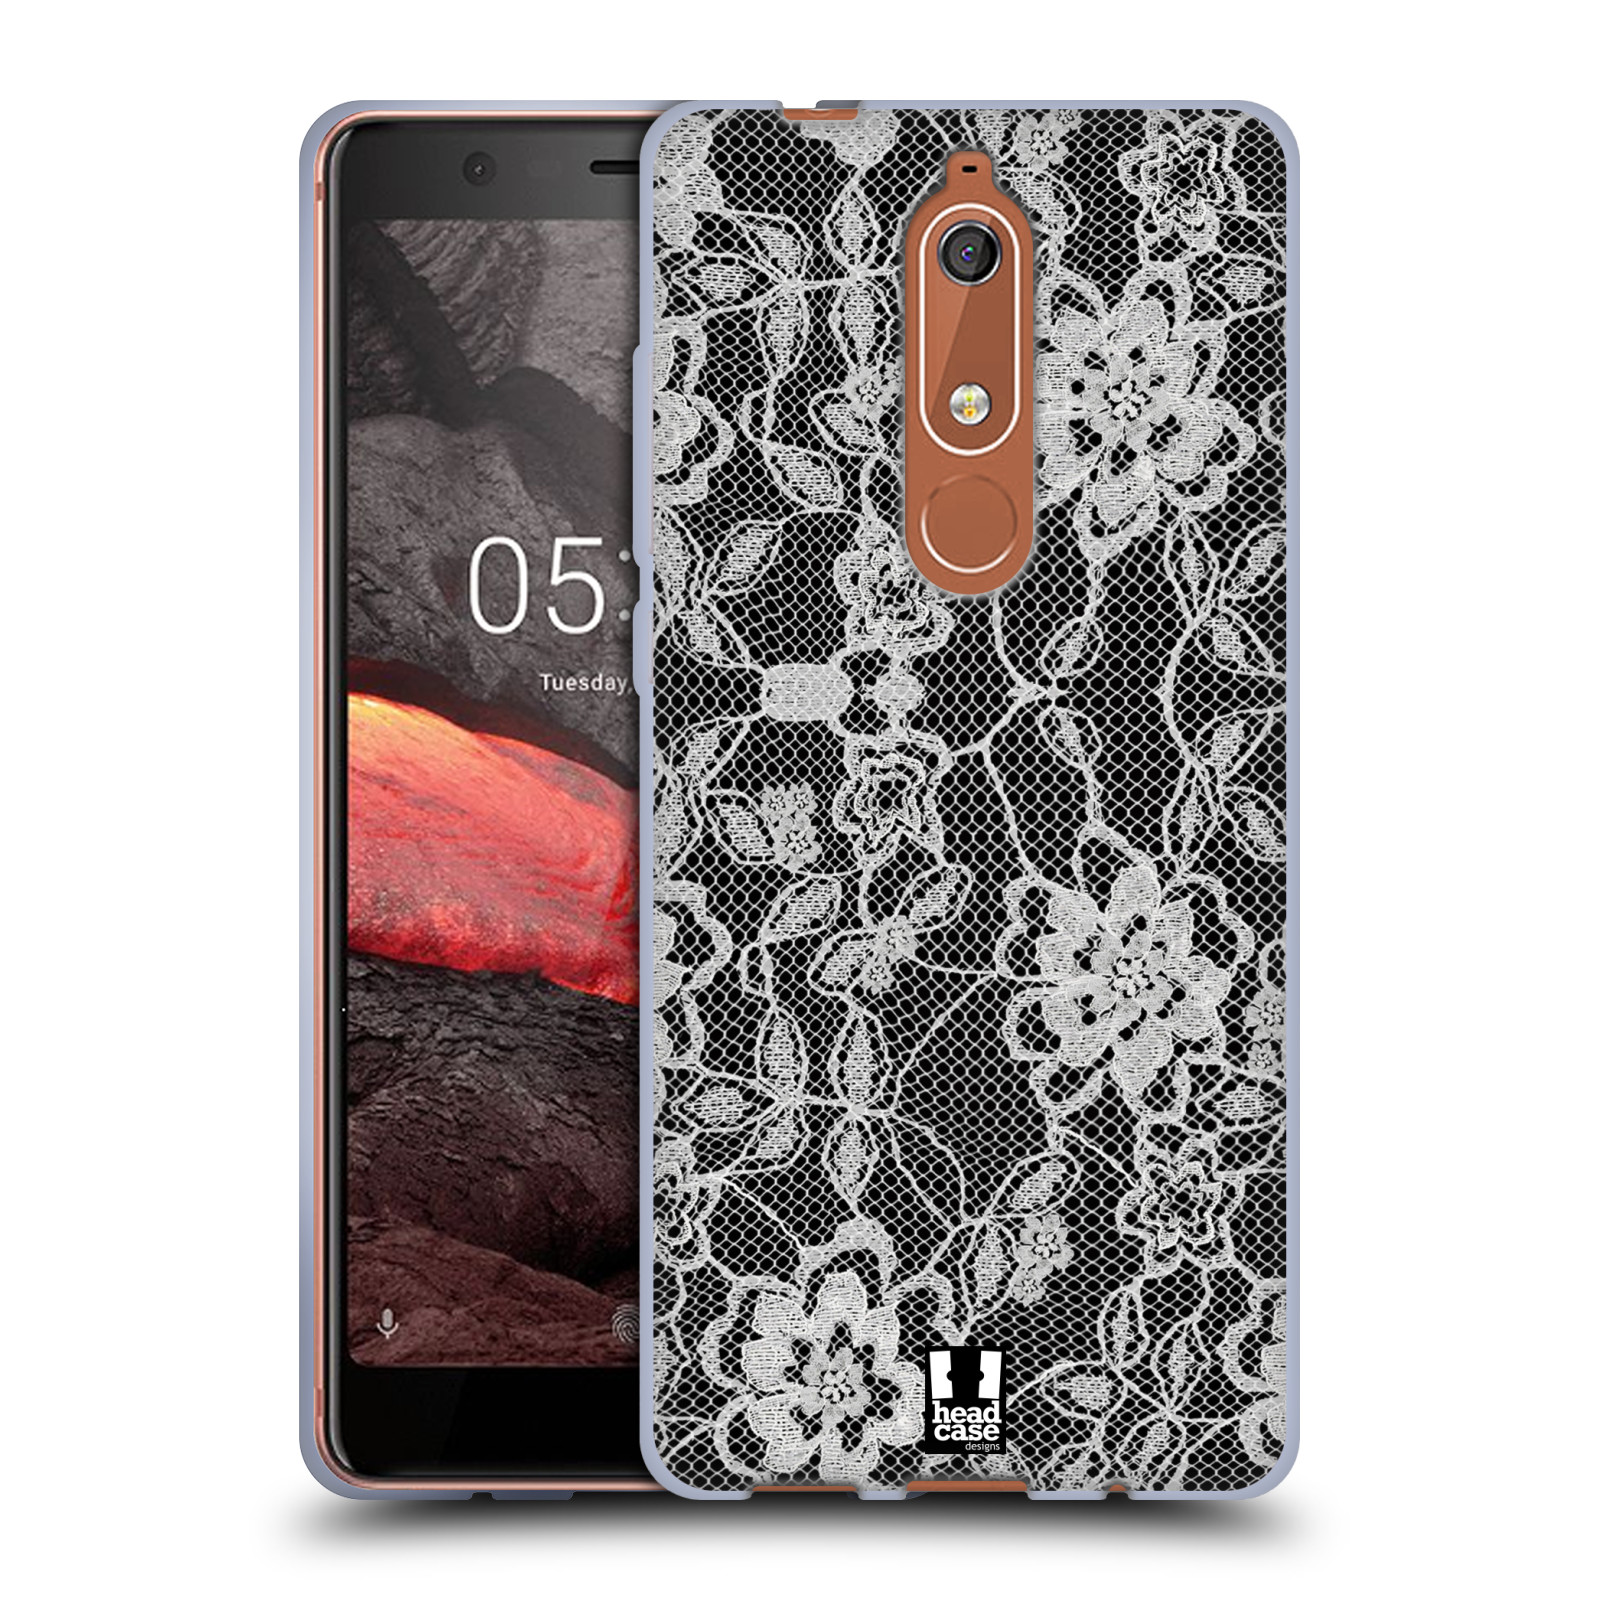 Silikonové pouzdro na mobil Nokia 5.1 - Head Case - FLOWERY KRAJKA